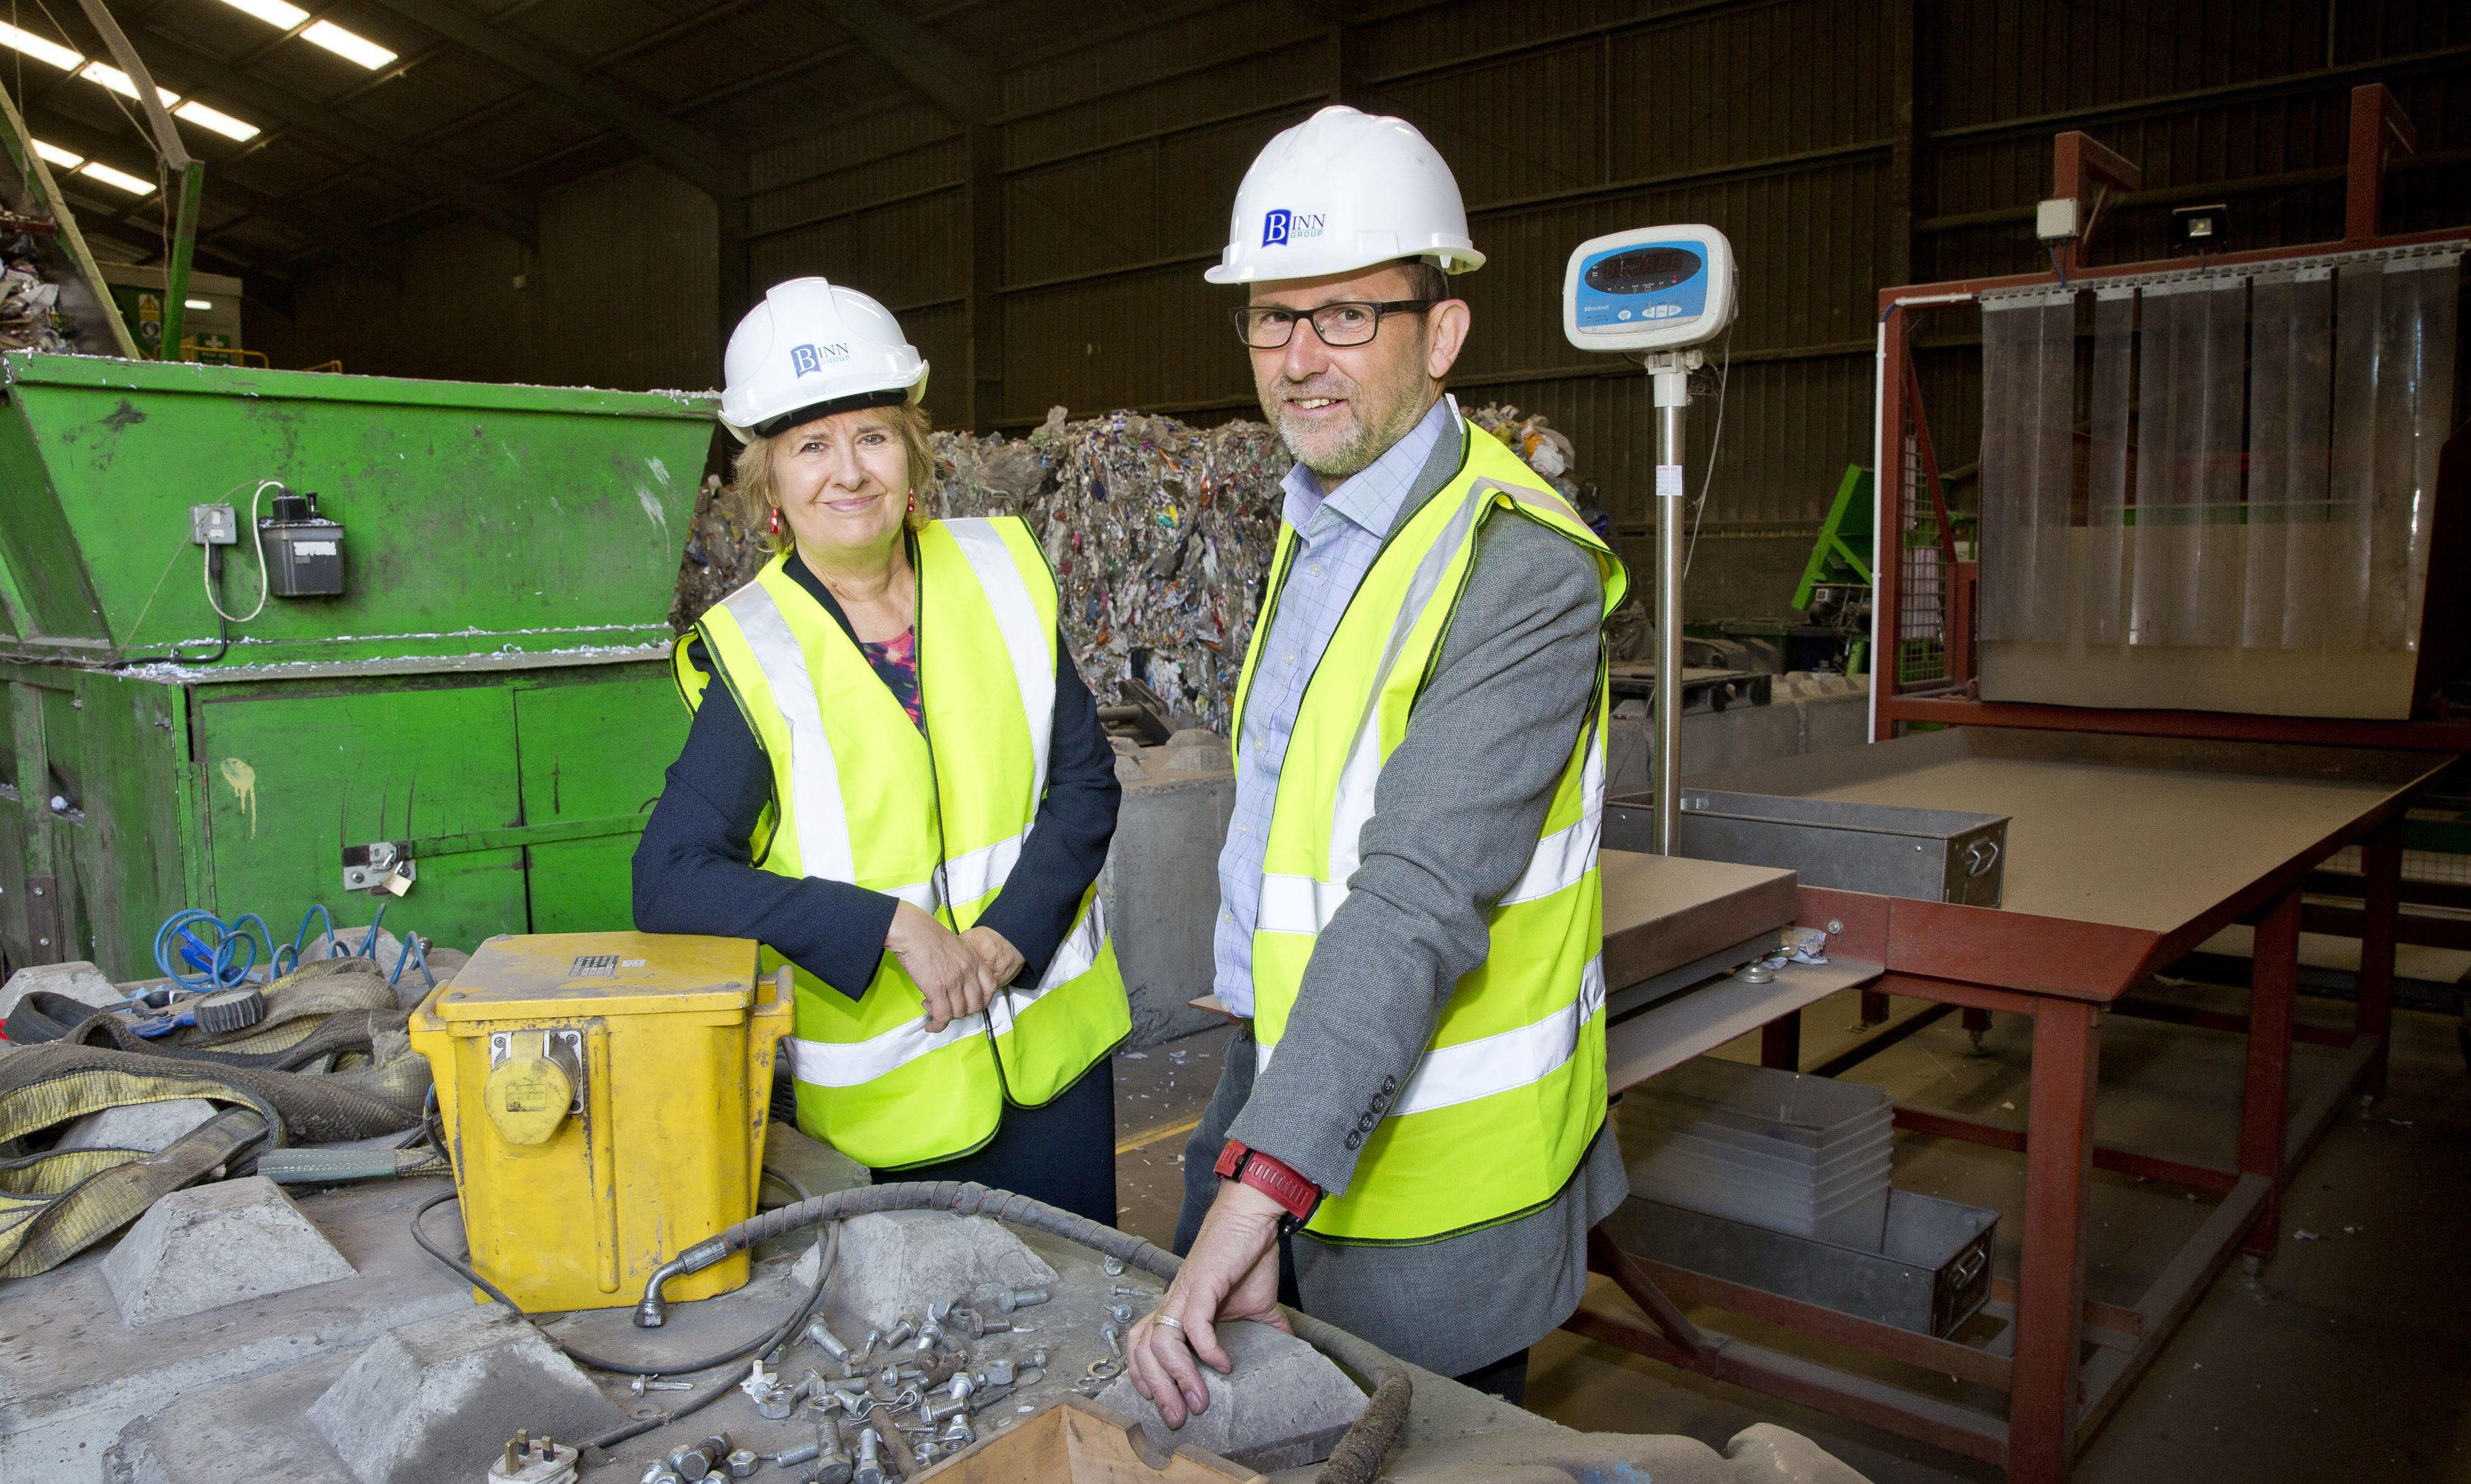 Cabinet Secretary Roseanna Cunningham and Zero Waste Scotland CEO Iain Gulland at Binn Farm, Glenfarg.